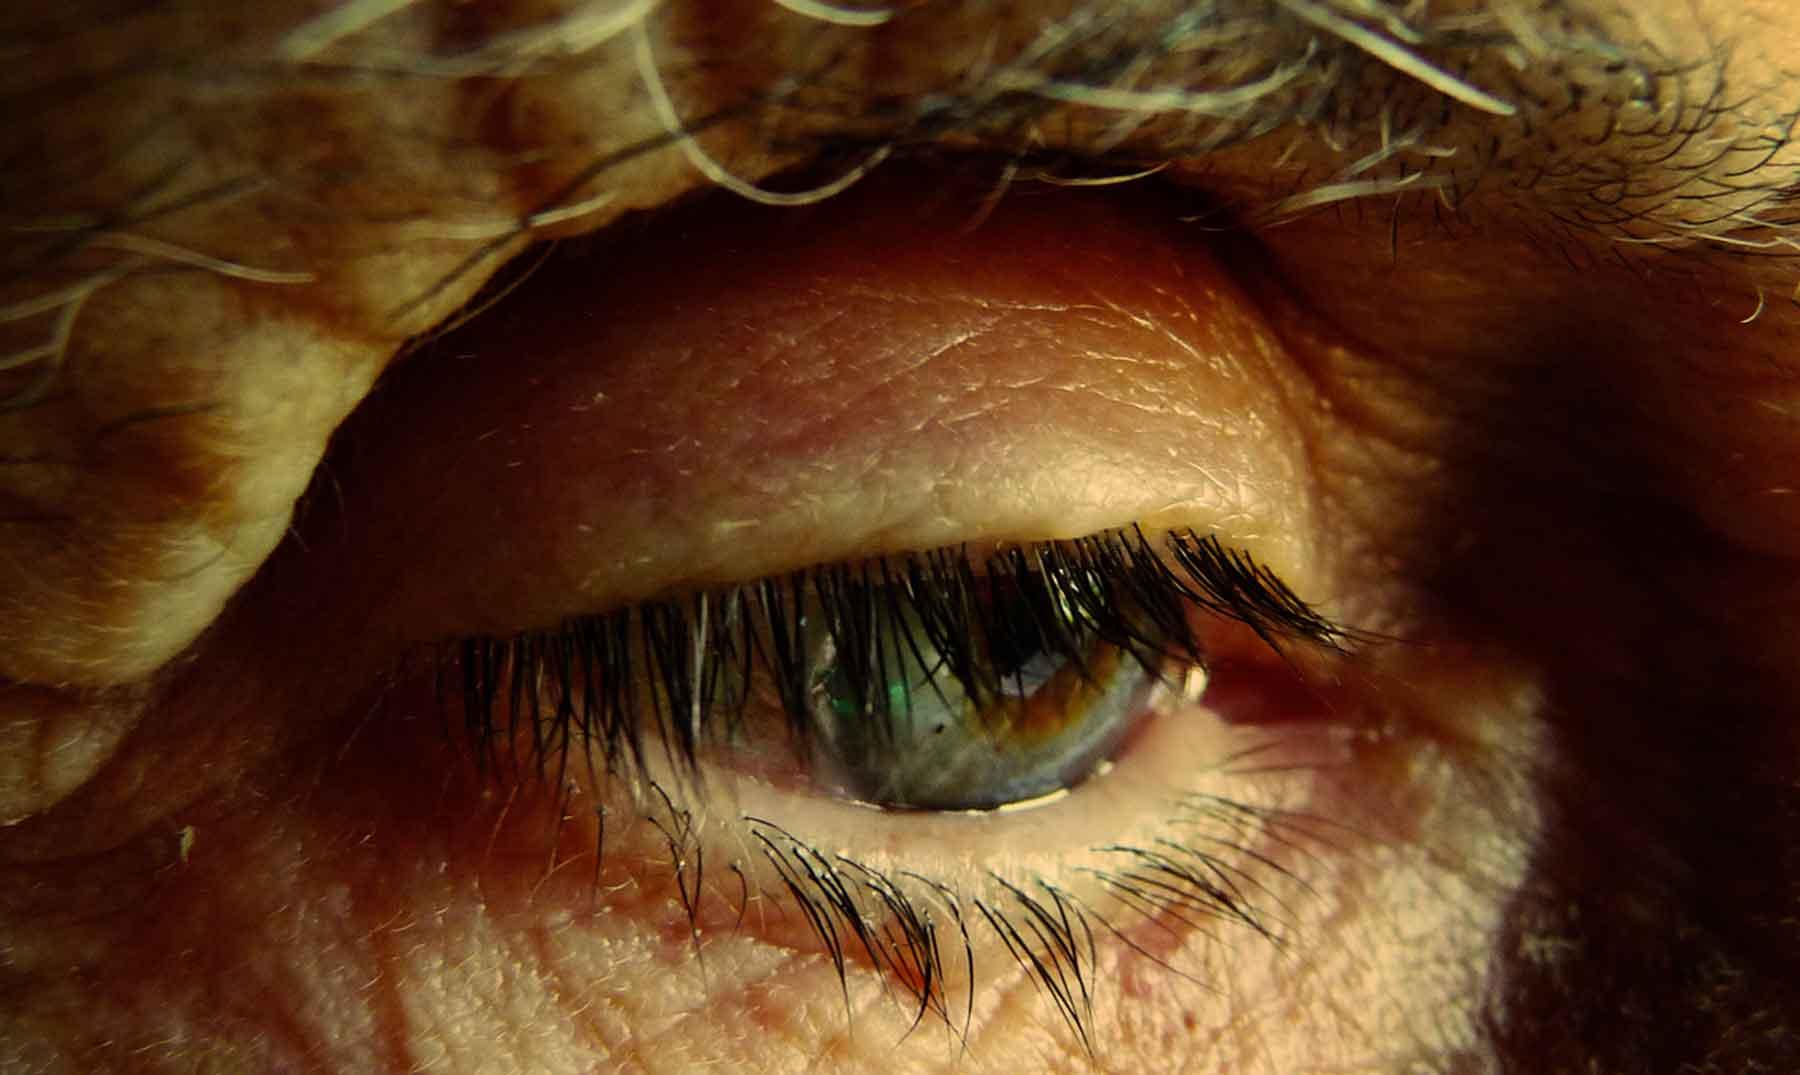 ¿Se podrían recuperar recuerdos perdidos en enfermos de Alzheimer